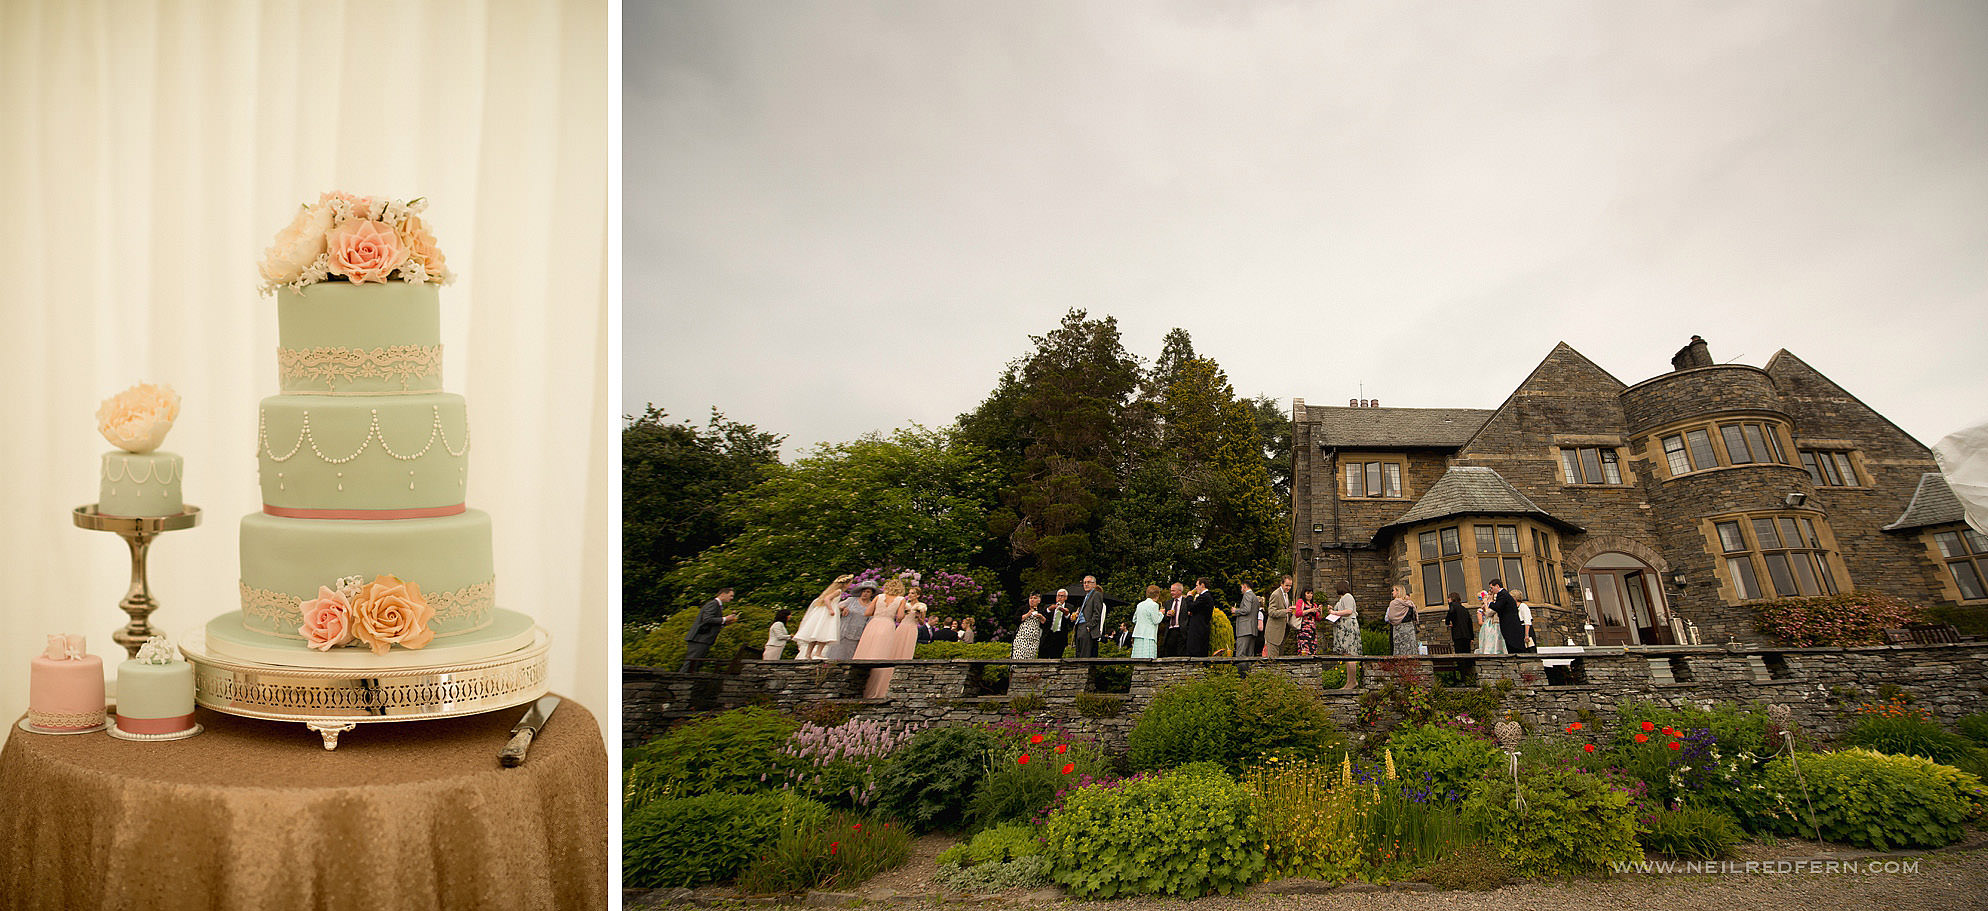 Cragwood Hotel wedding photographs 01